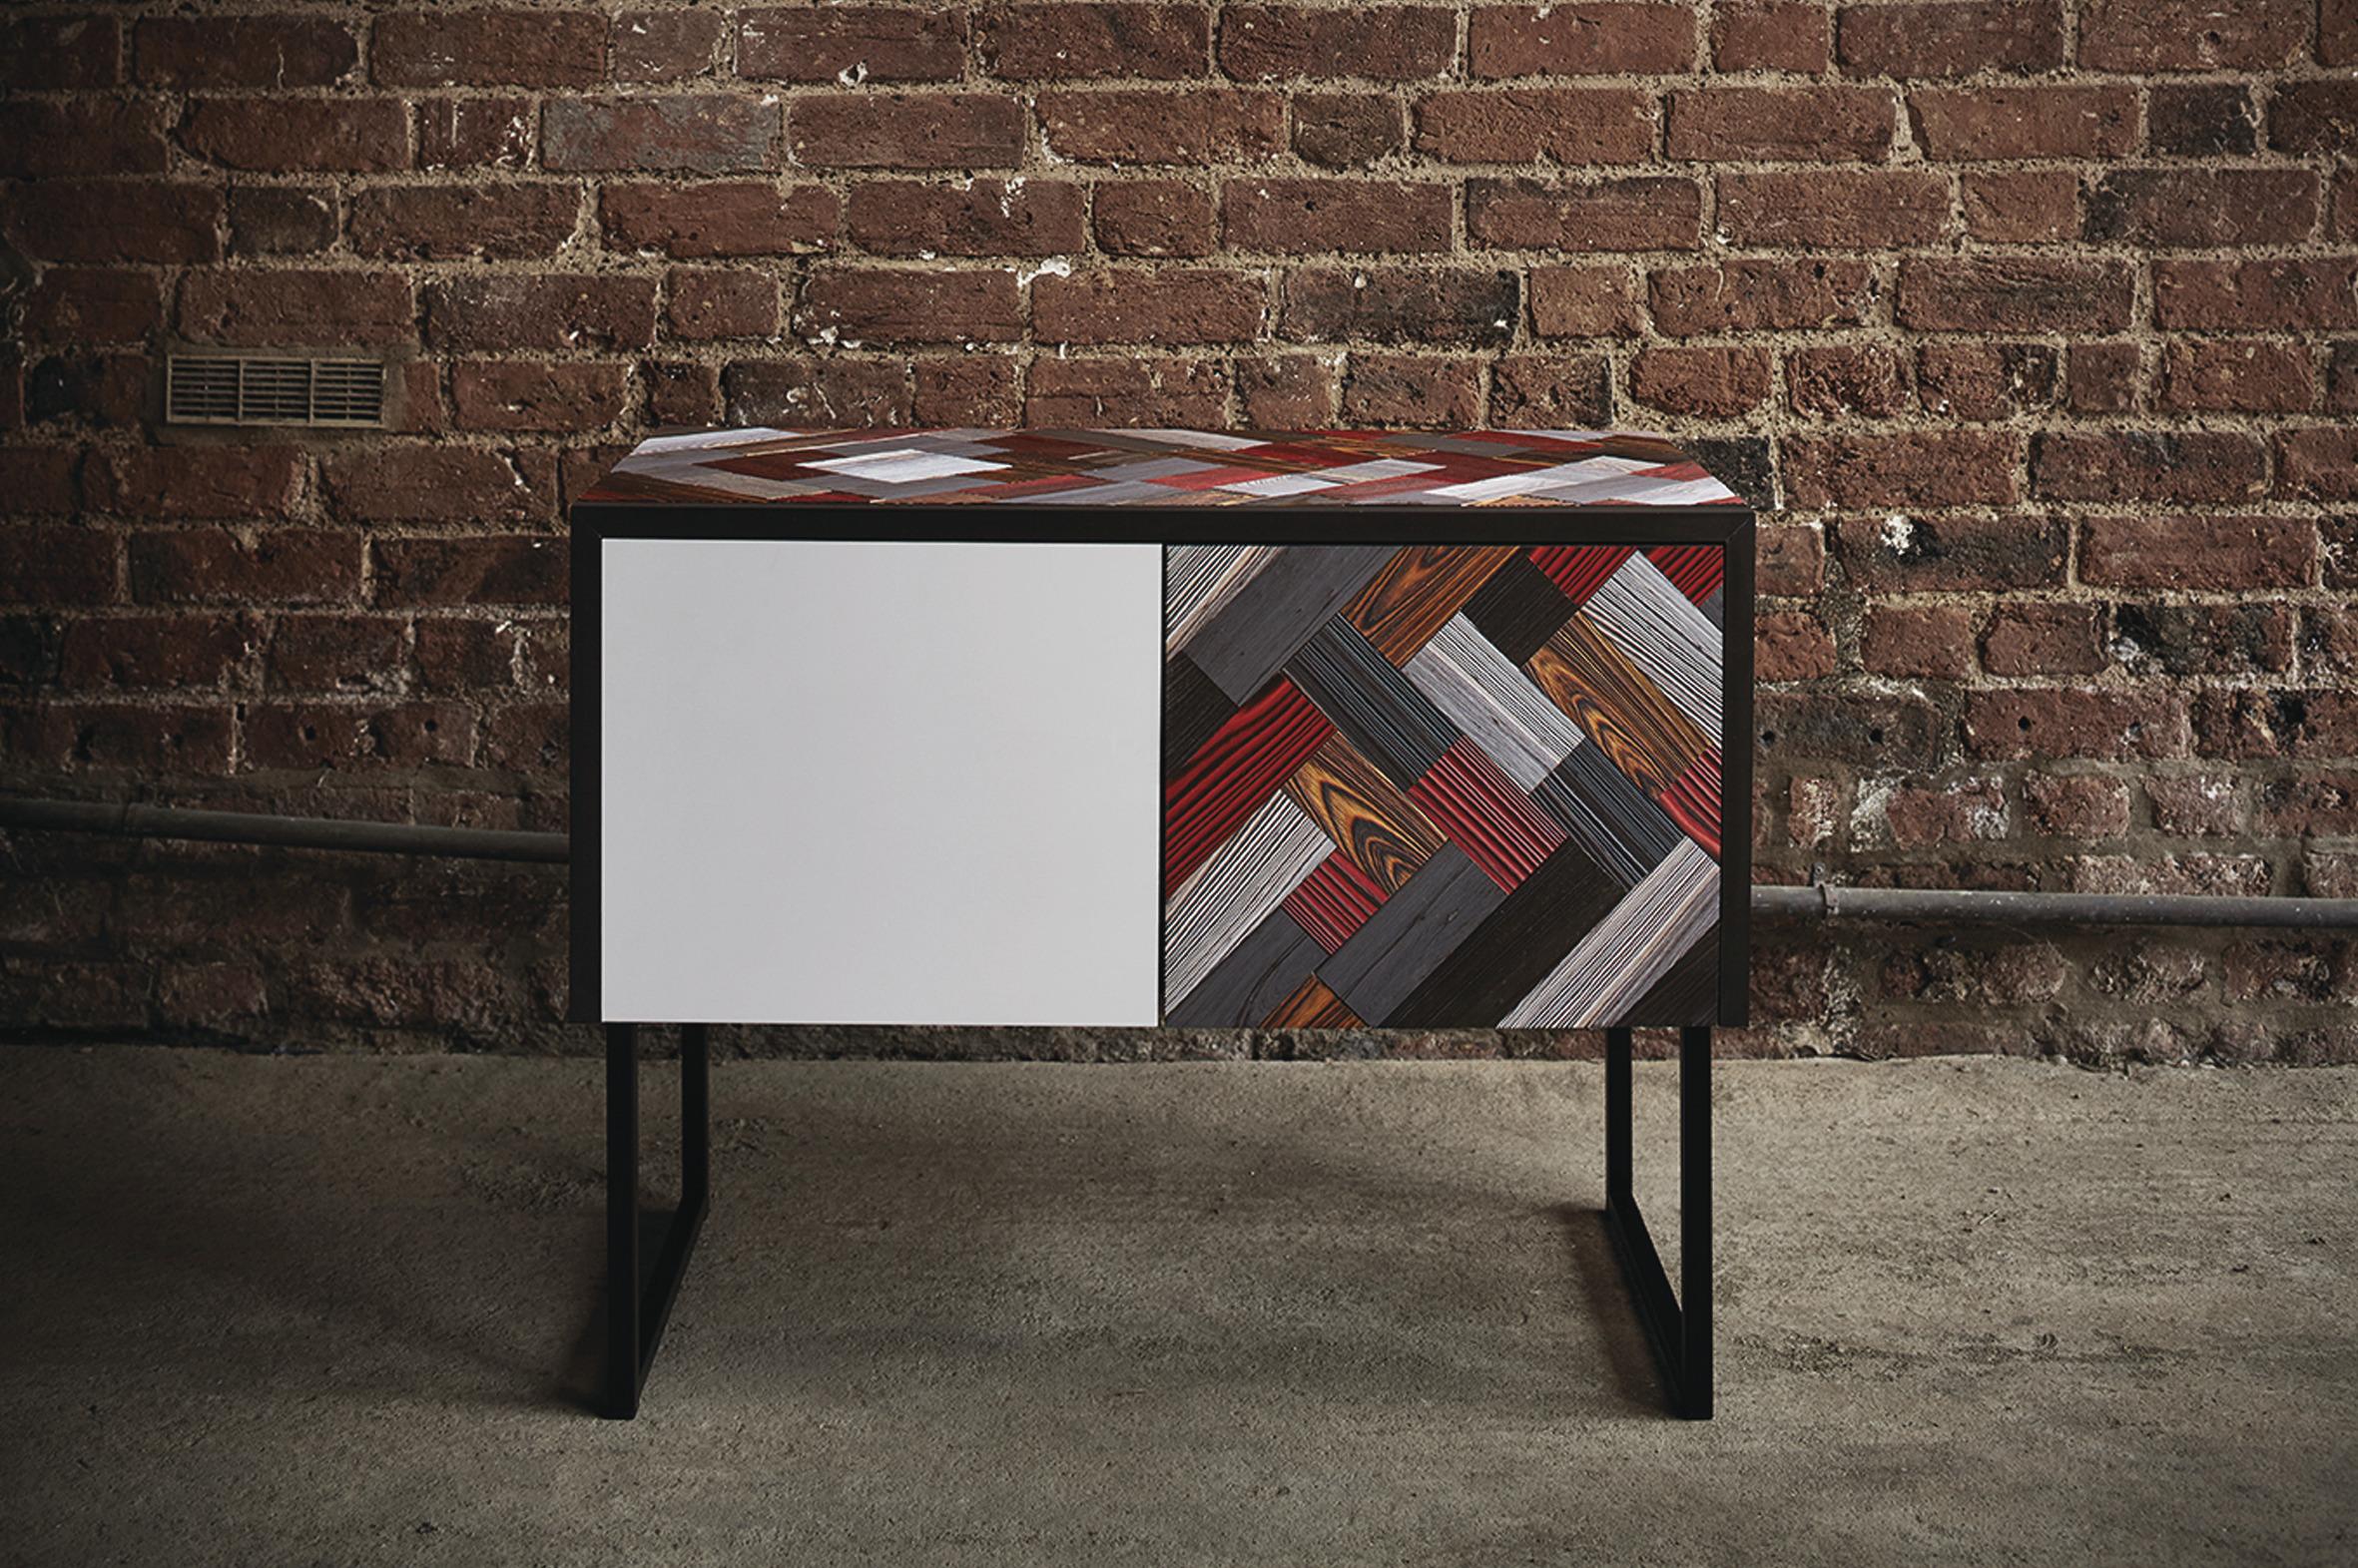 domotex 2017 parkett und laminatfu b den stylepark. Black Bedroom Furniture Sets. Home Design Ideas